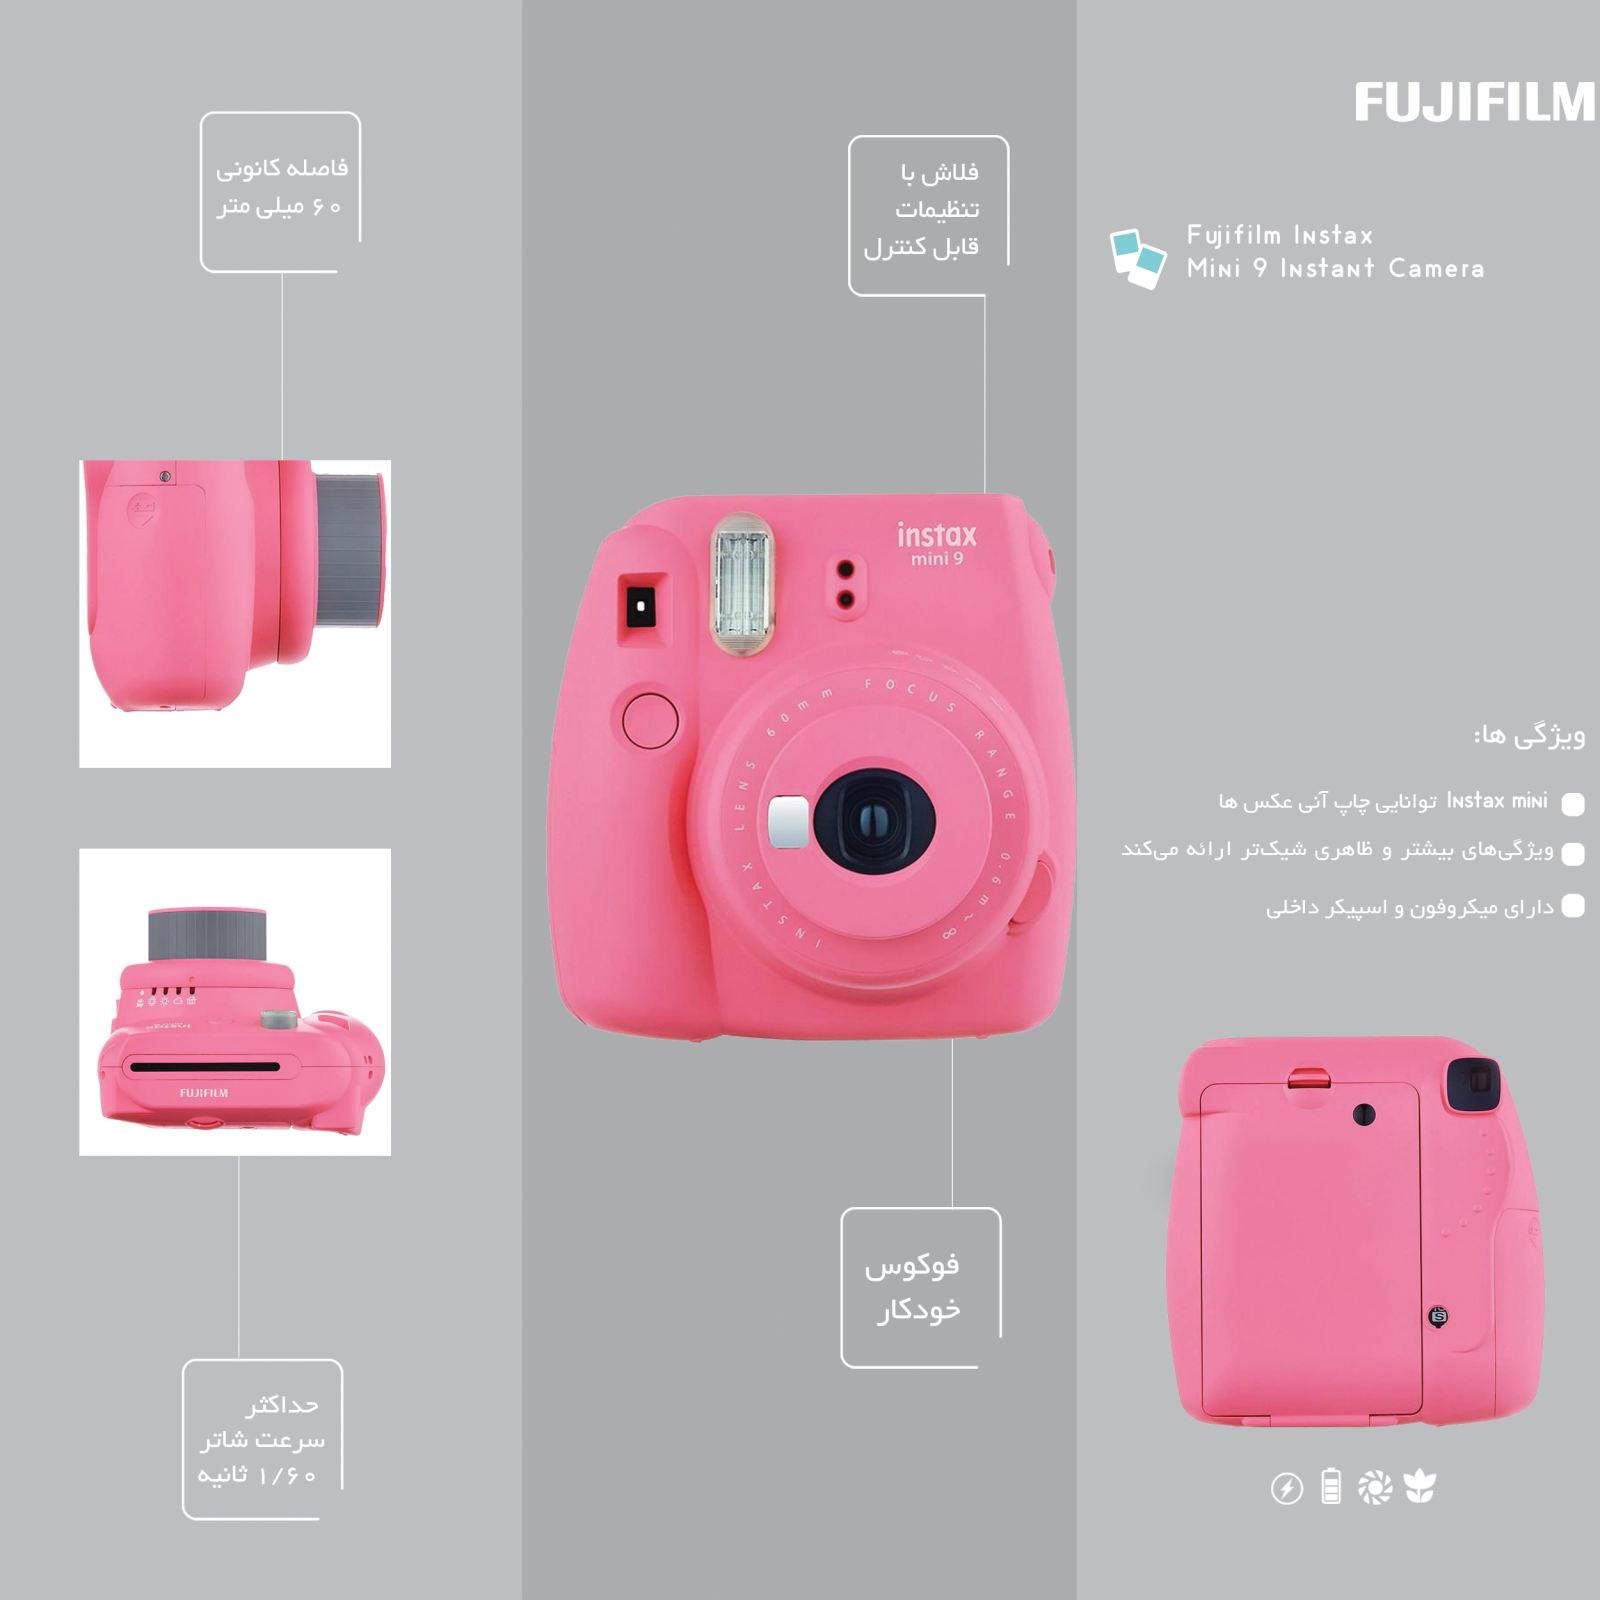 دوربین عکاسی چاپ سریع فوجی فیلم مدل Instax Mini 9 به همراه  فیلم مخصوص main 1 43